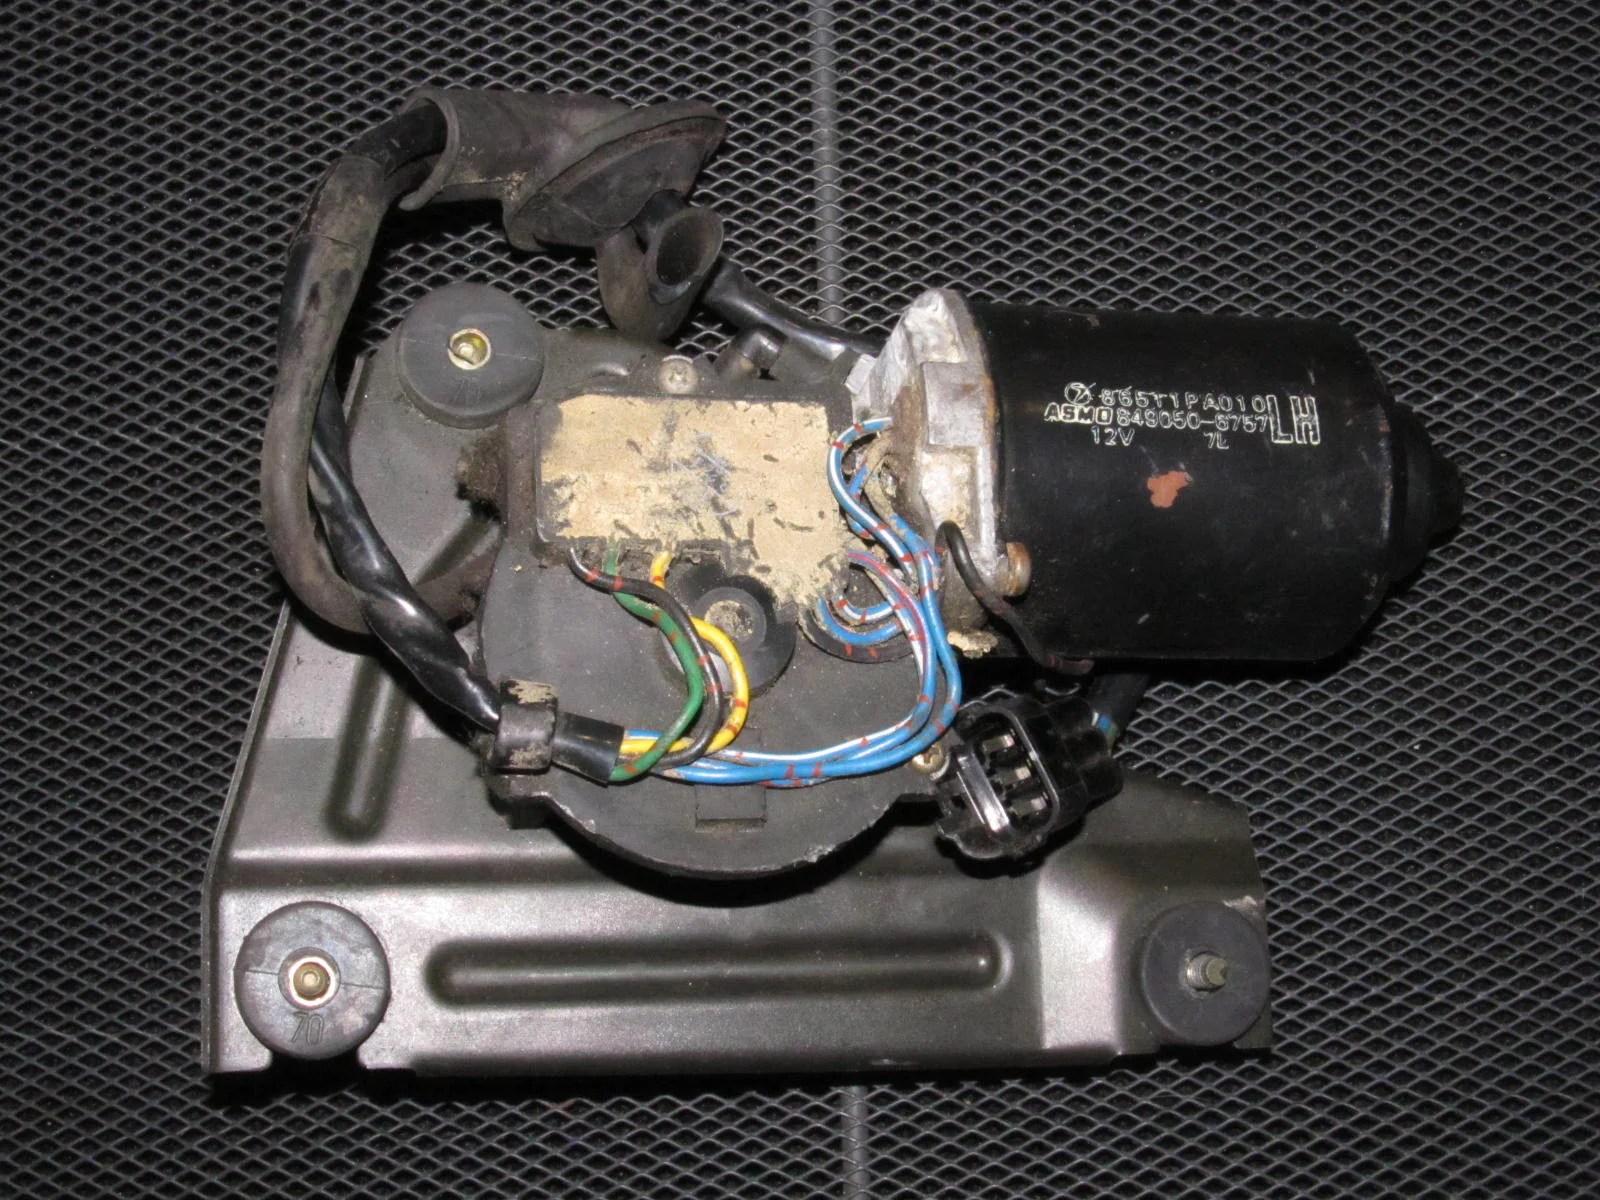 92 97 subaru svx oem wiper motor front [ 1600 x 1200 Pixel ]